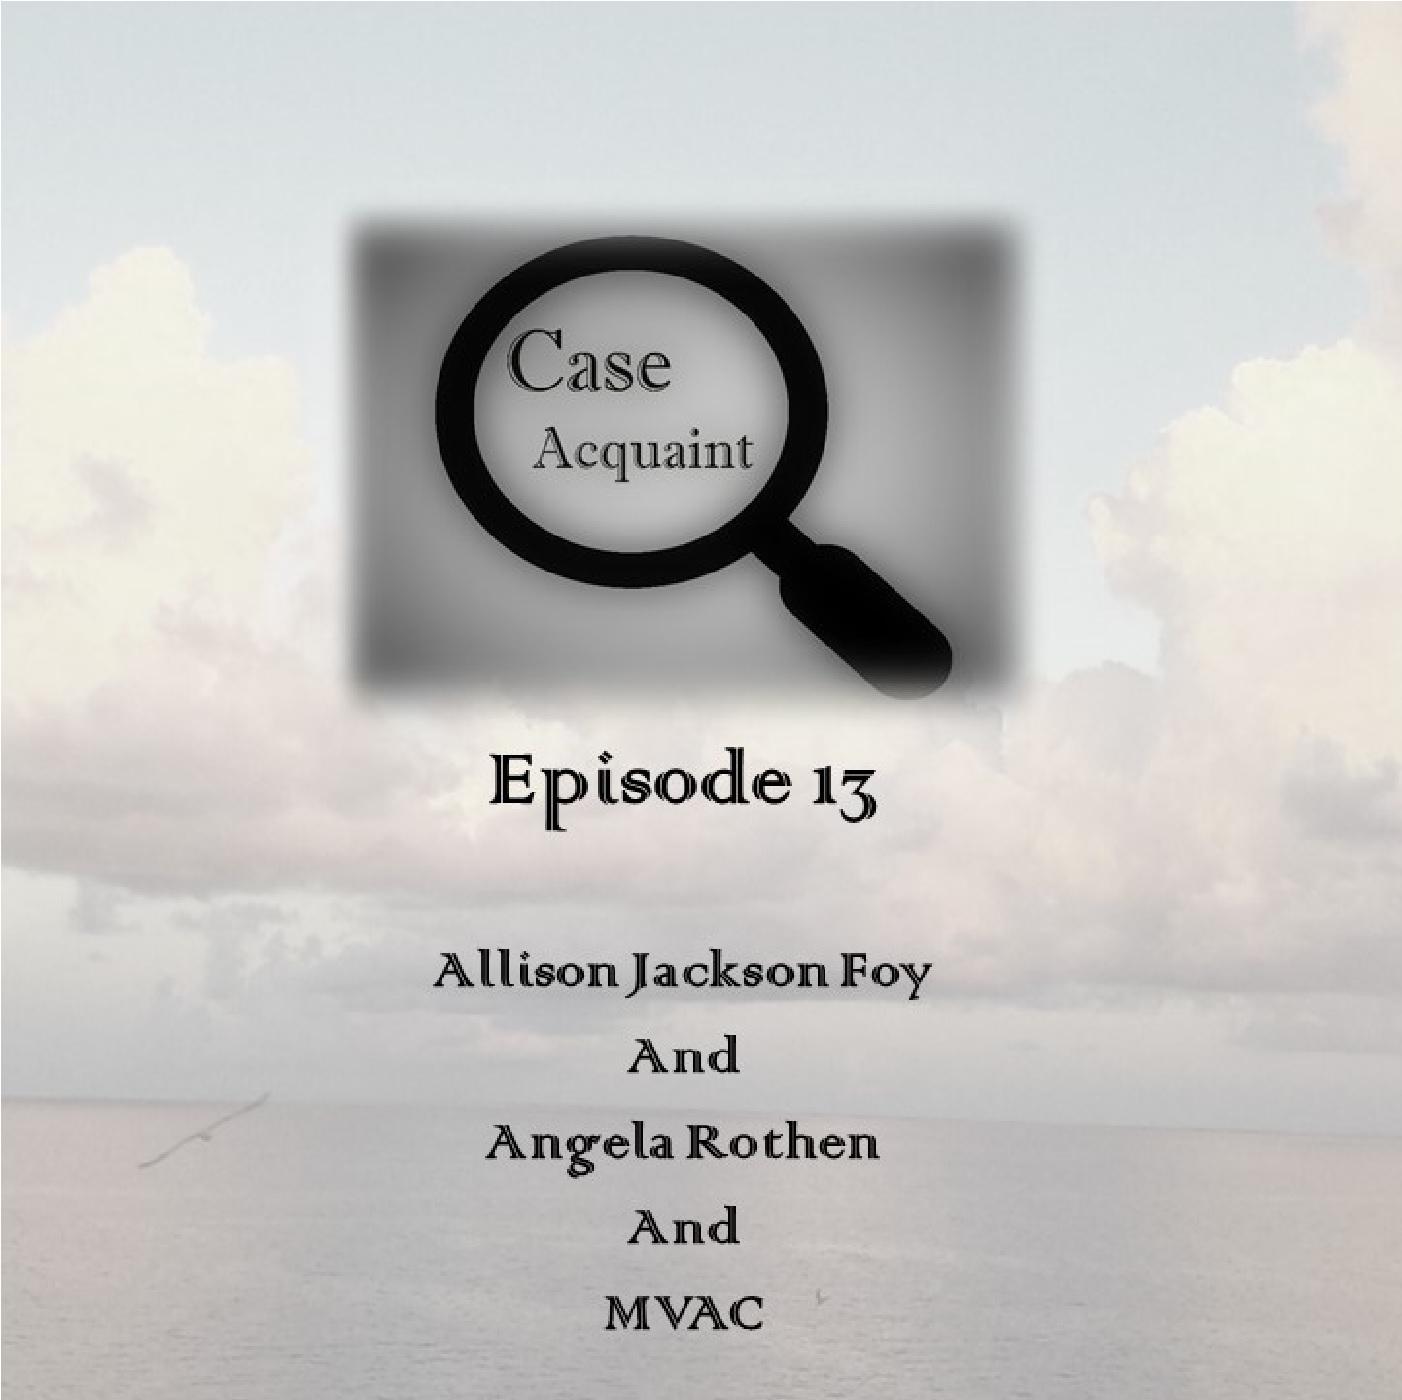 Episode 13 Allison Jackson Foy and the MVAC